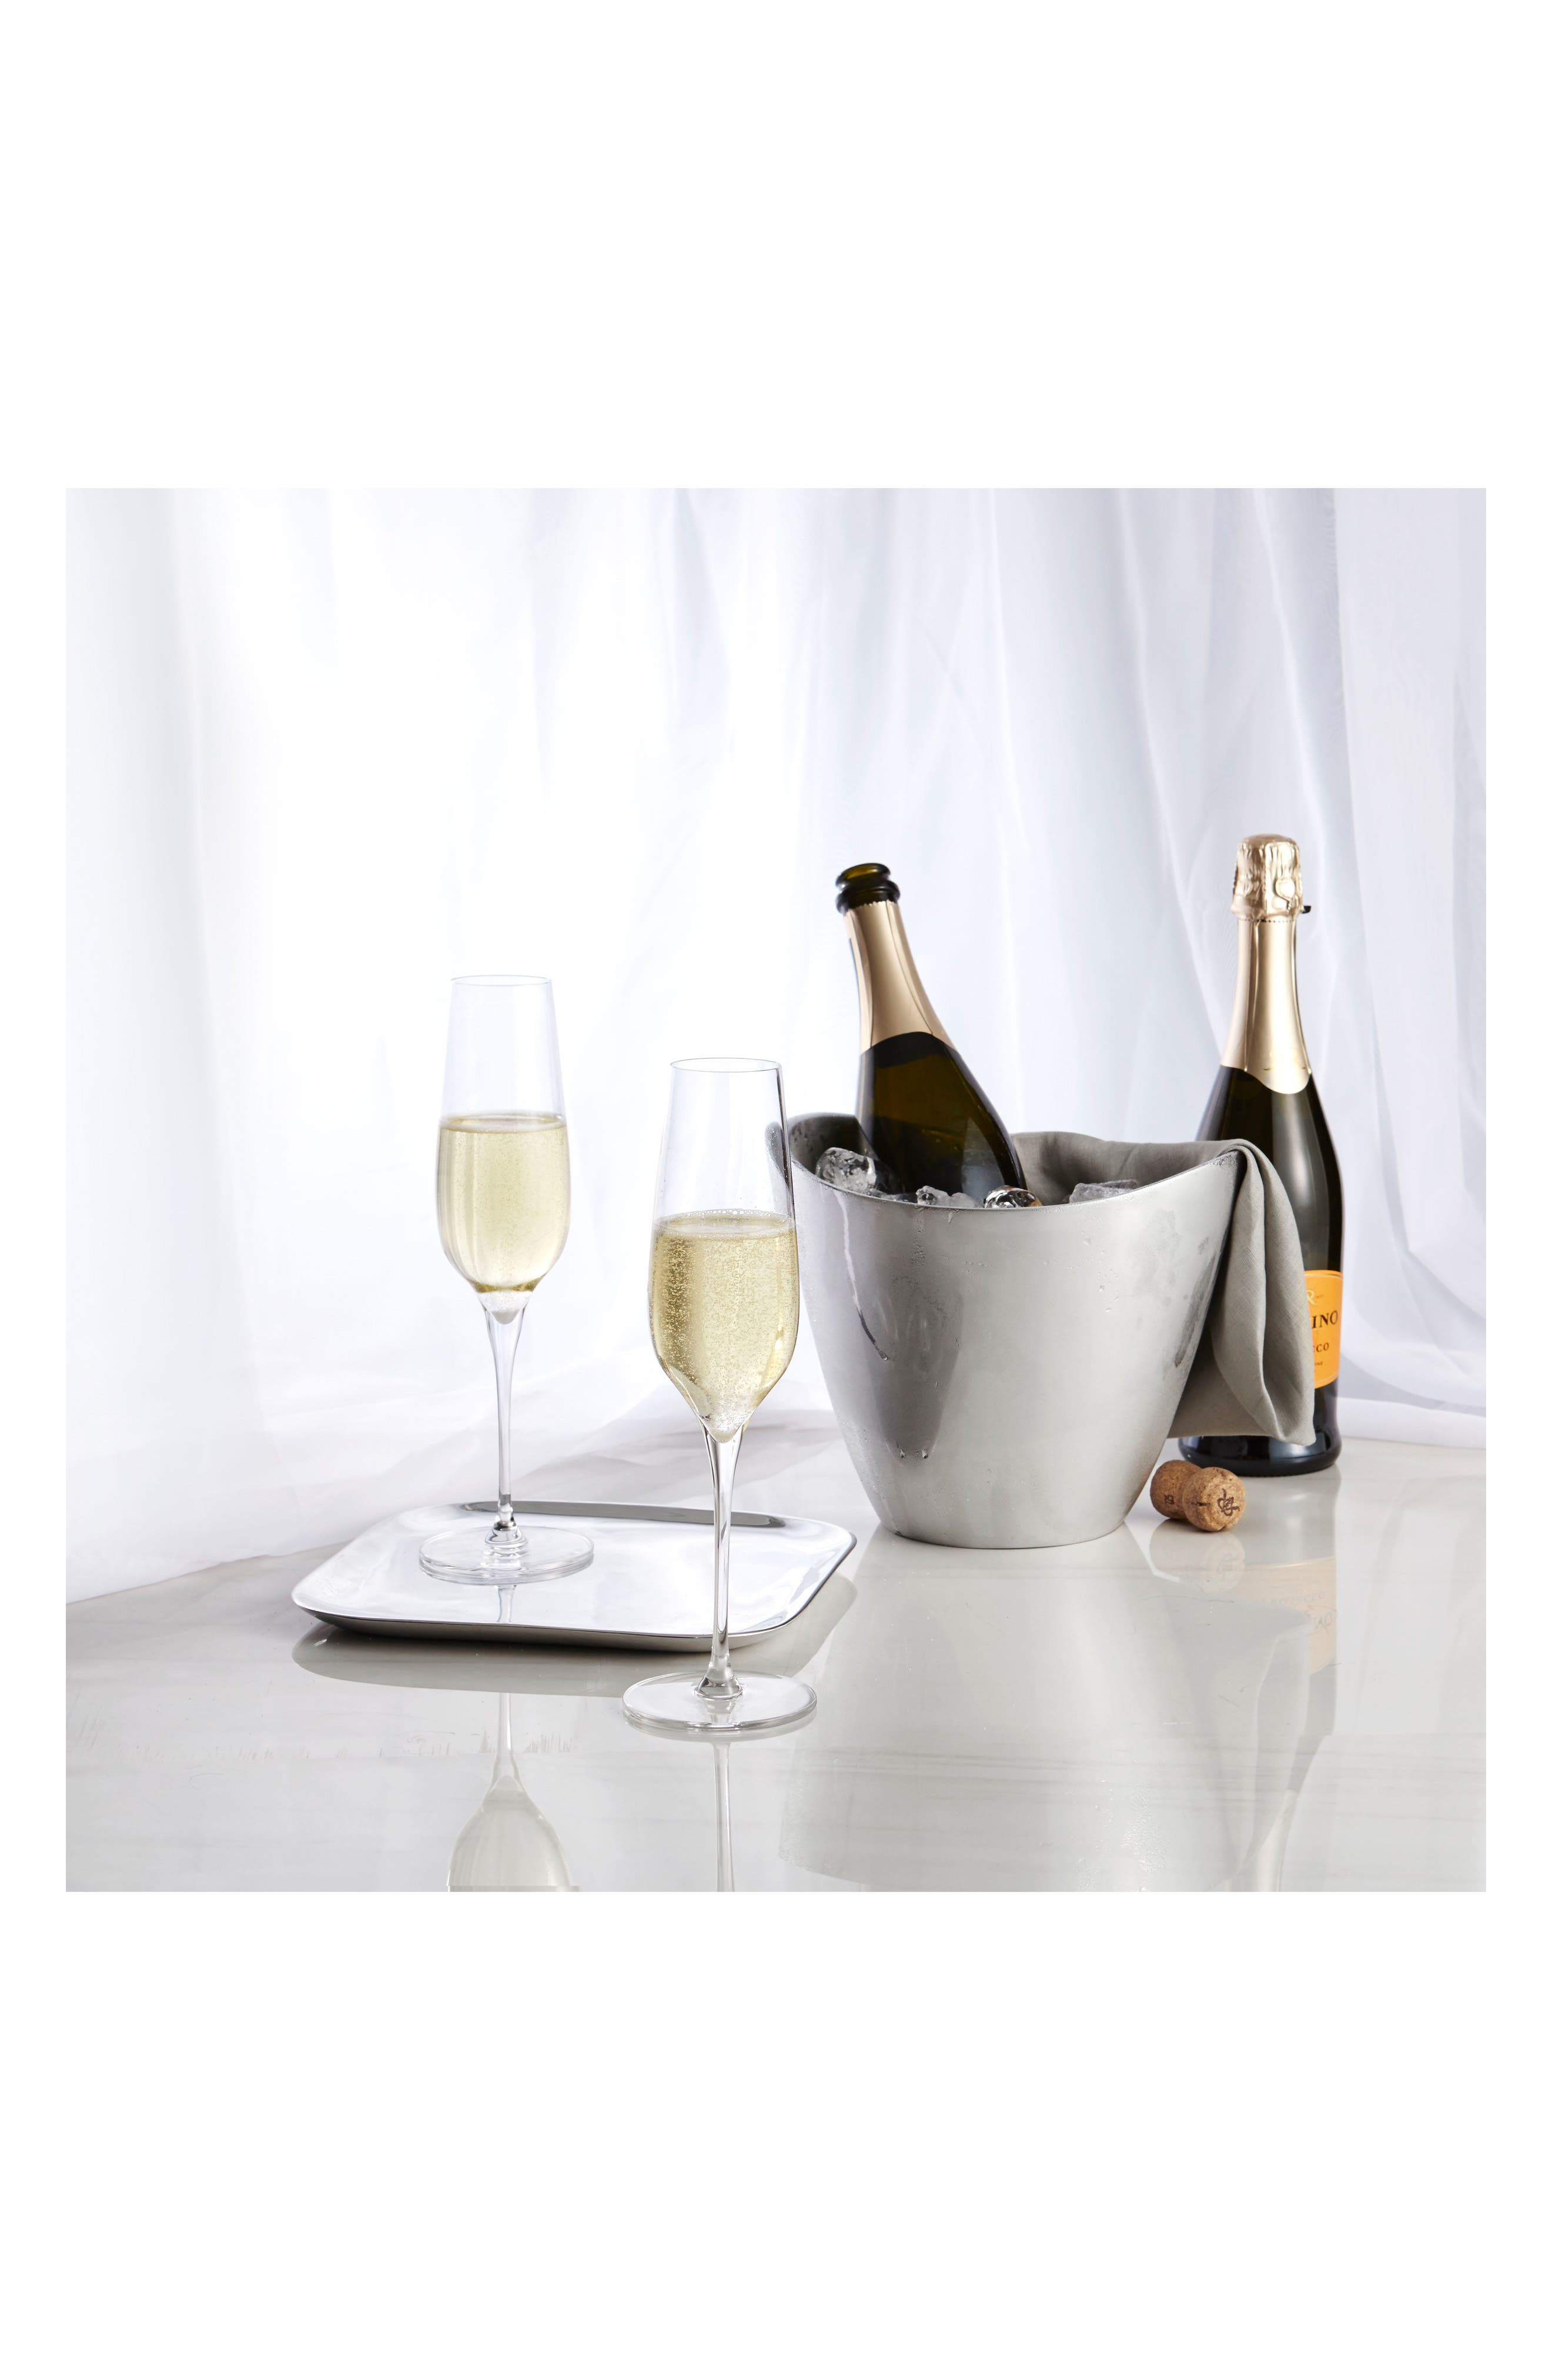 Vie Set of 2 Champagne Flutes,                             Alternate thumbnail 4, color,                             100